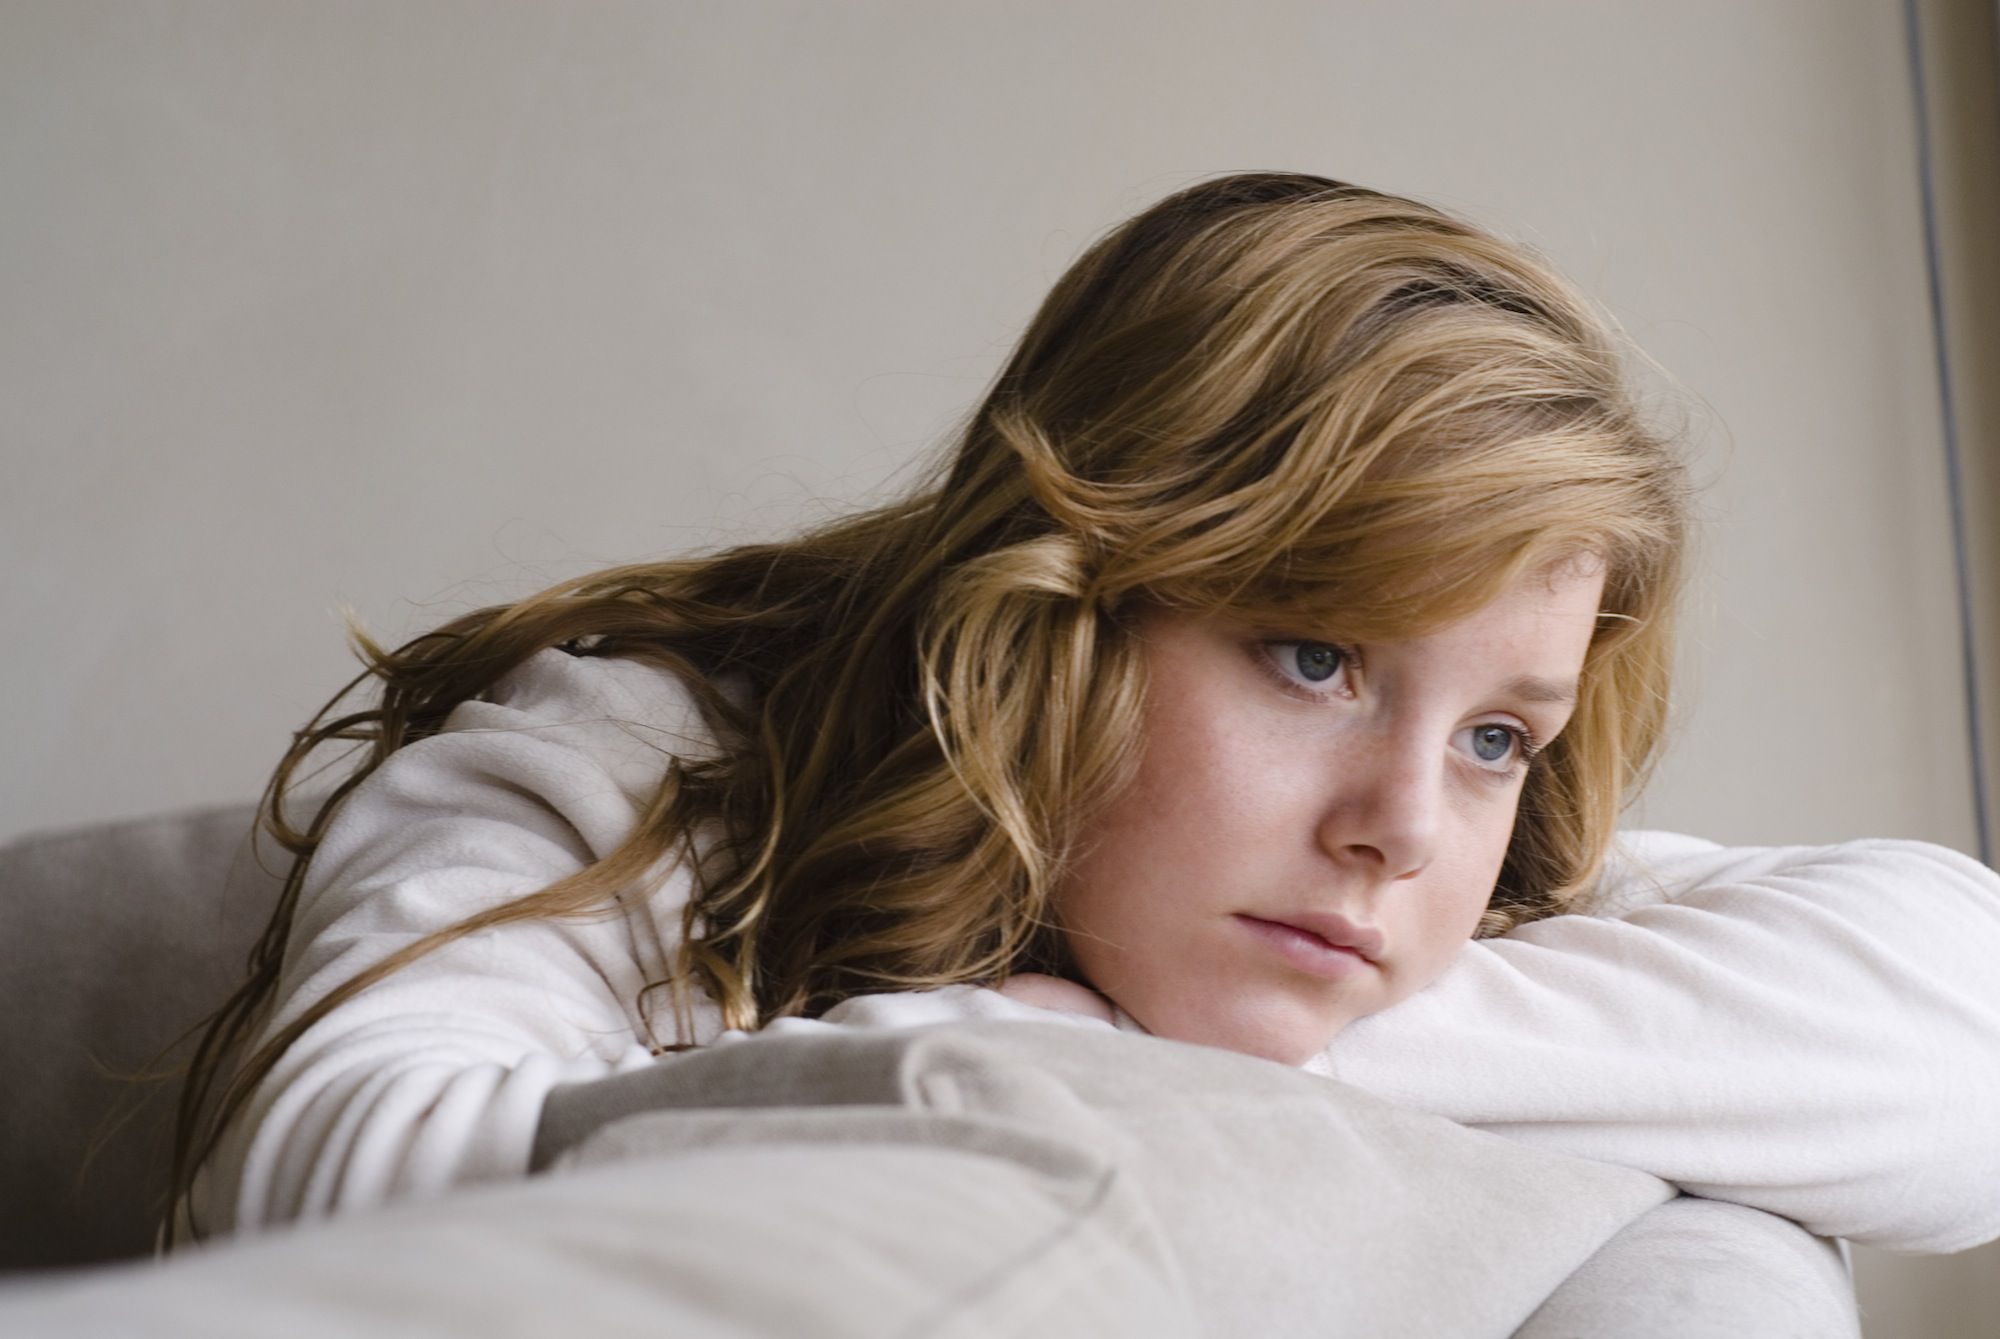 Girl menstrual cycle photo-8383